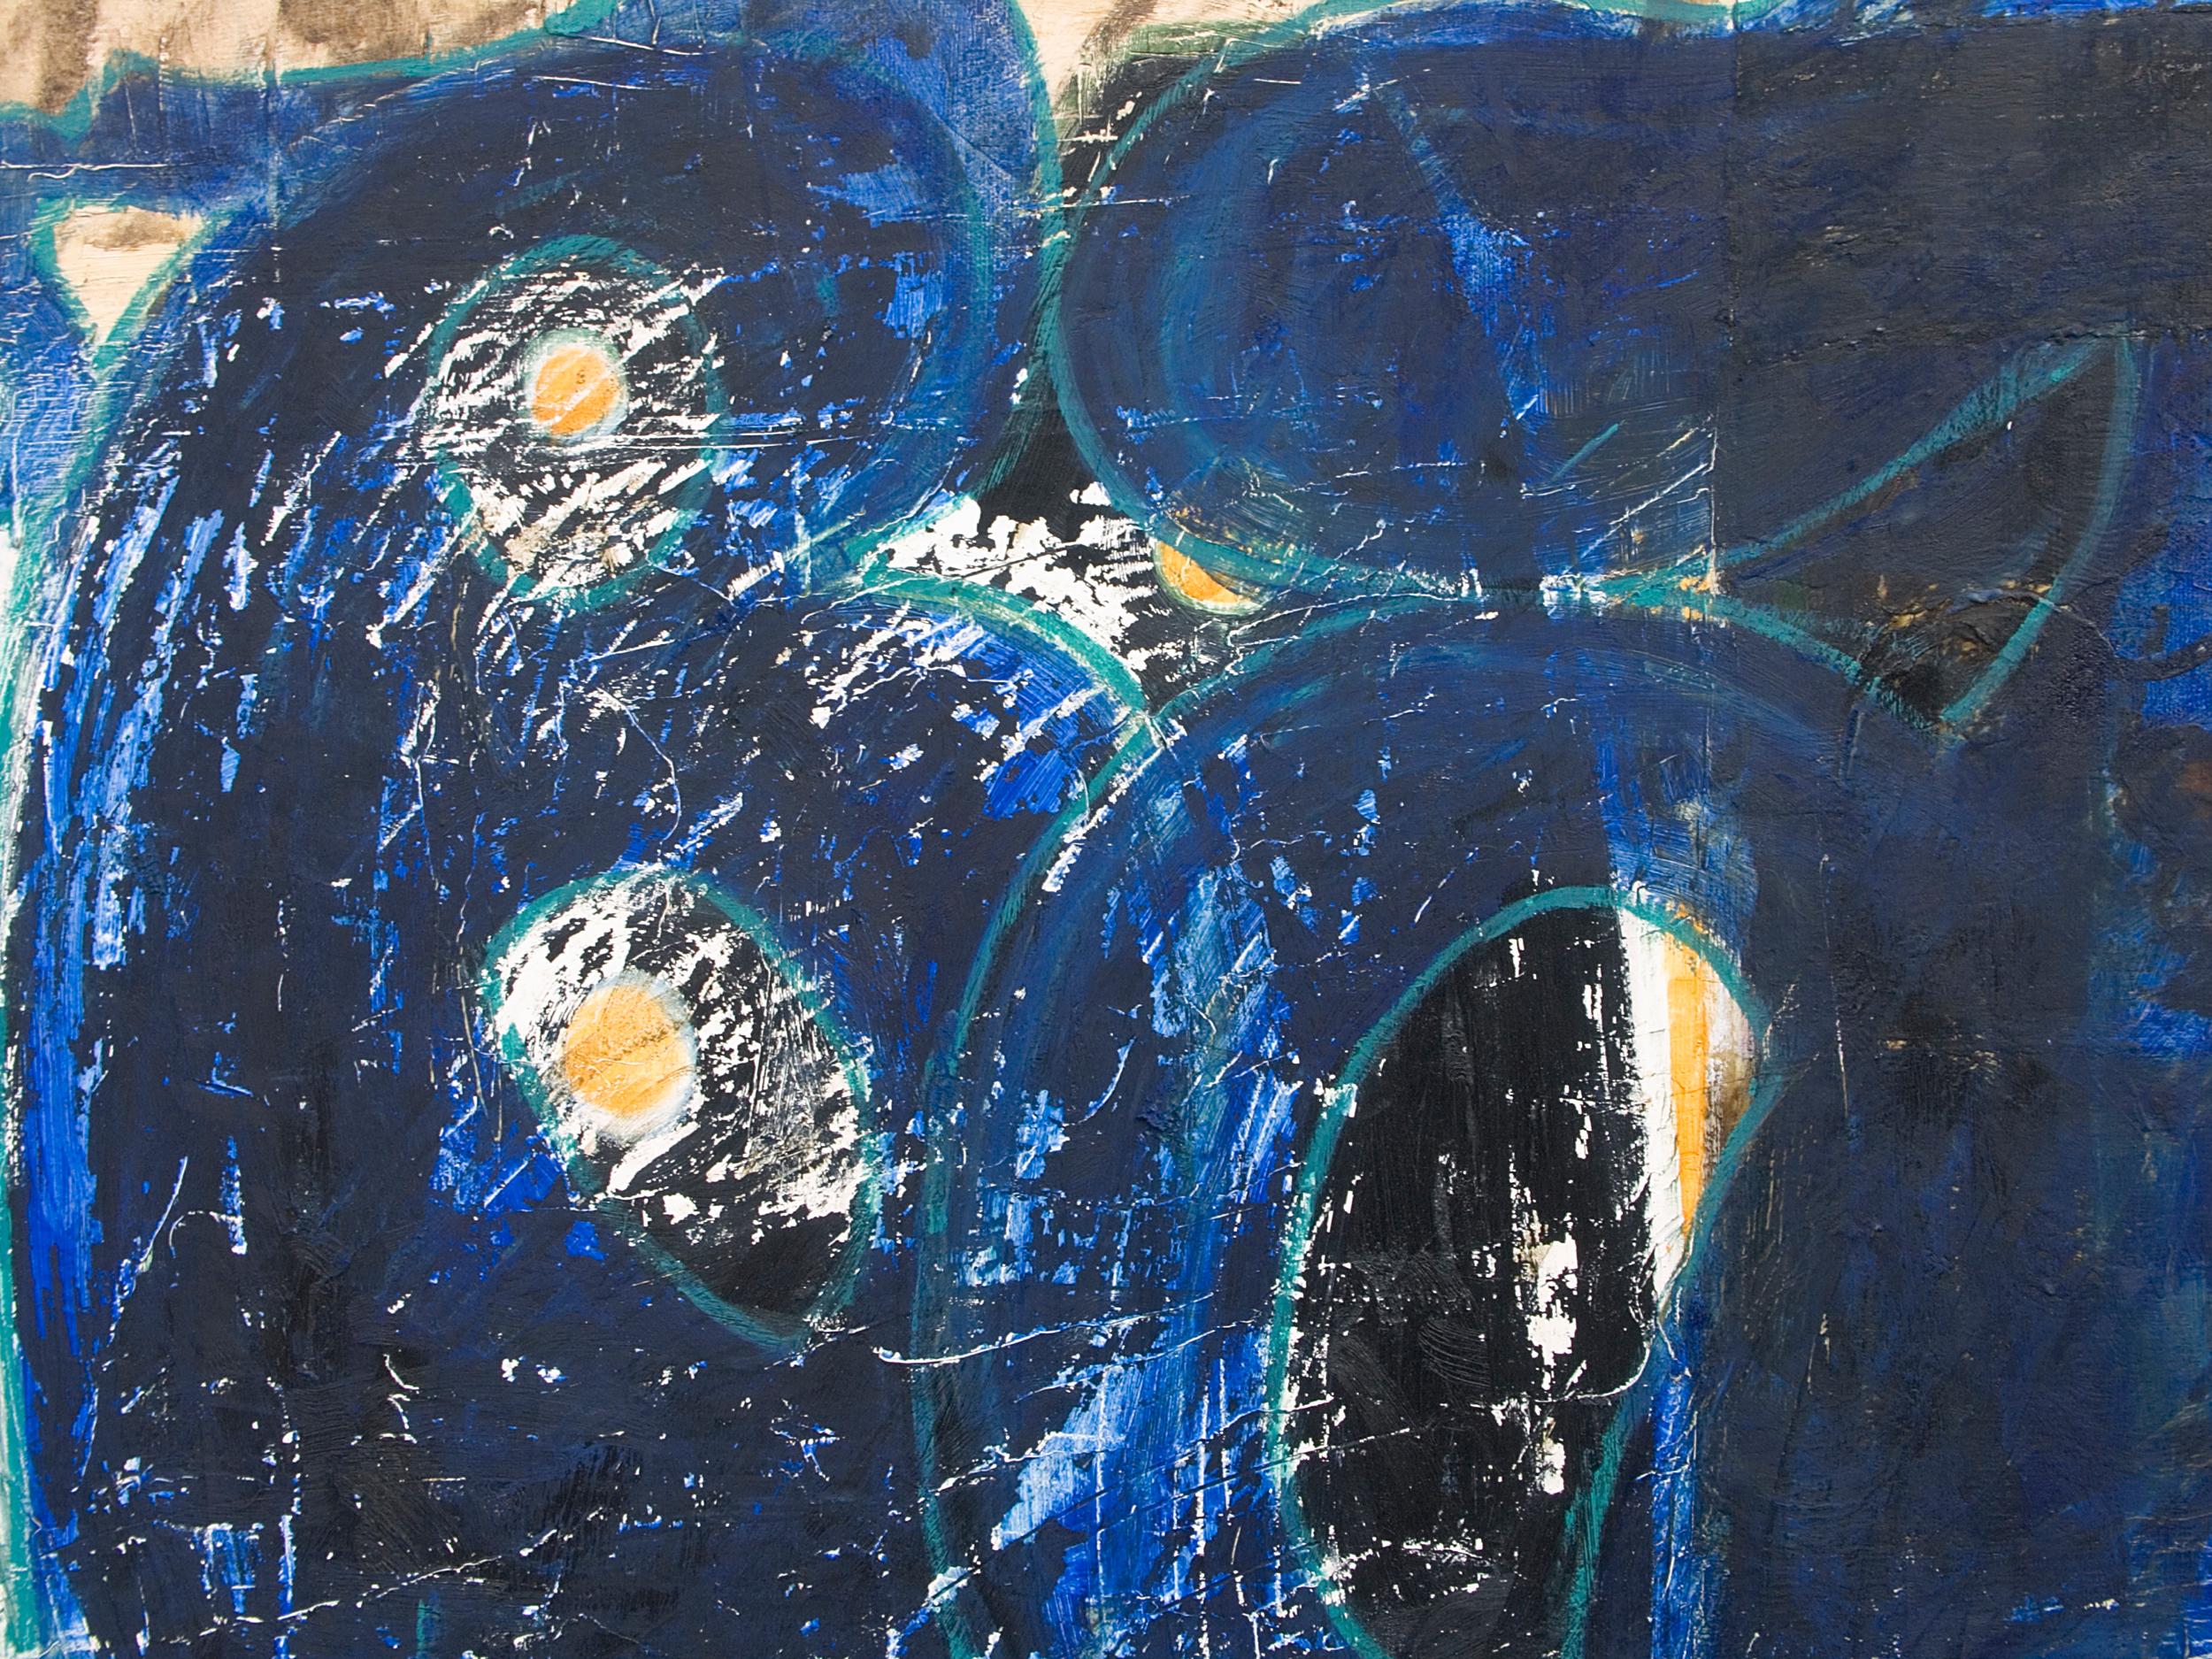 050425_MDS_GraffitiSeries_0007.jpg